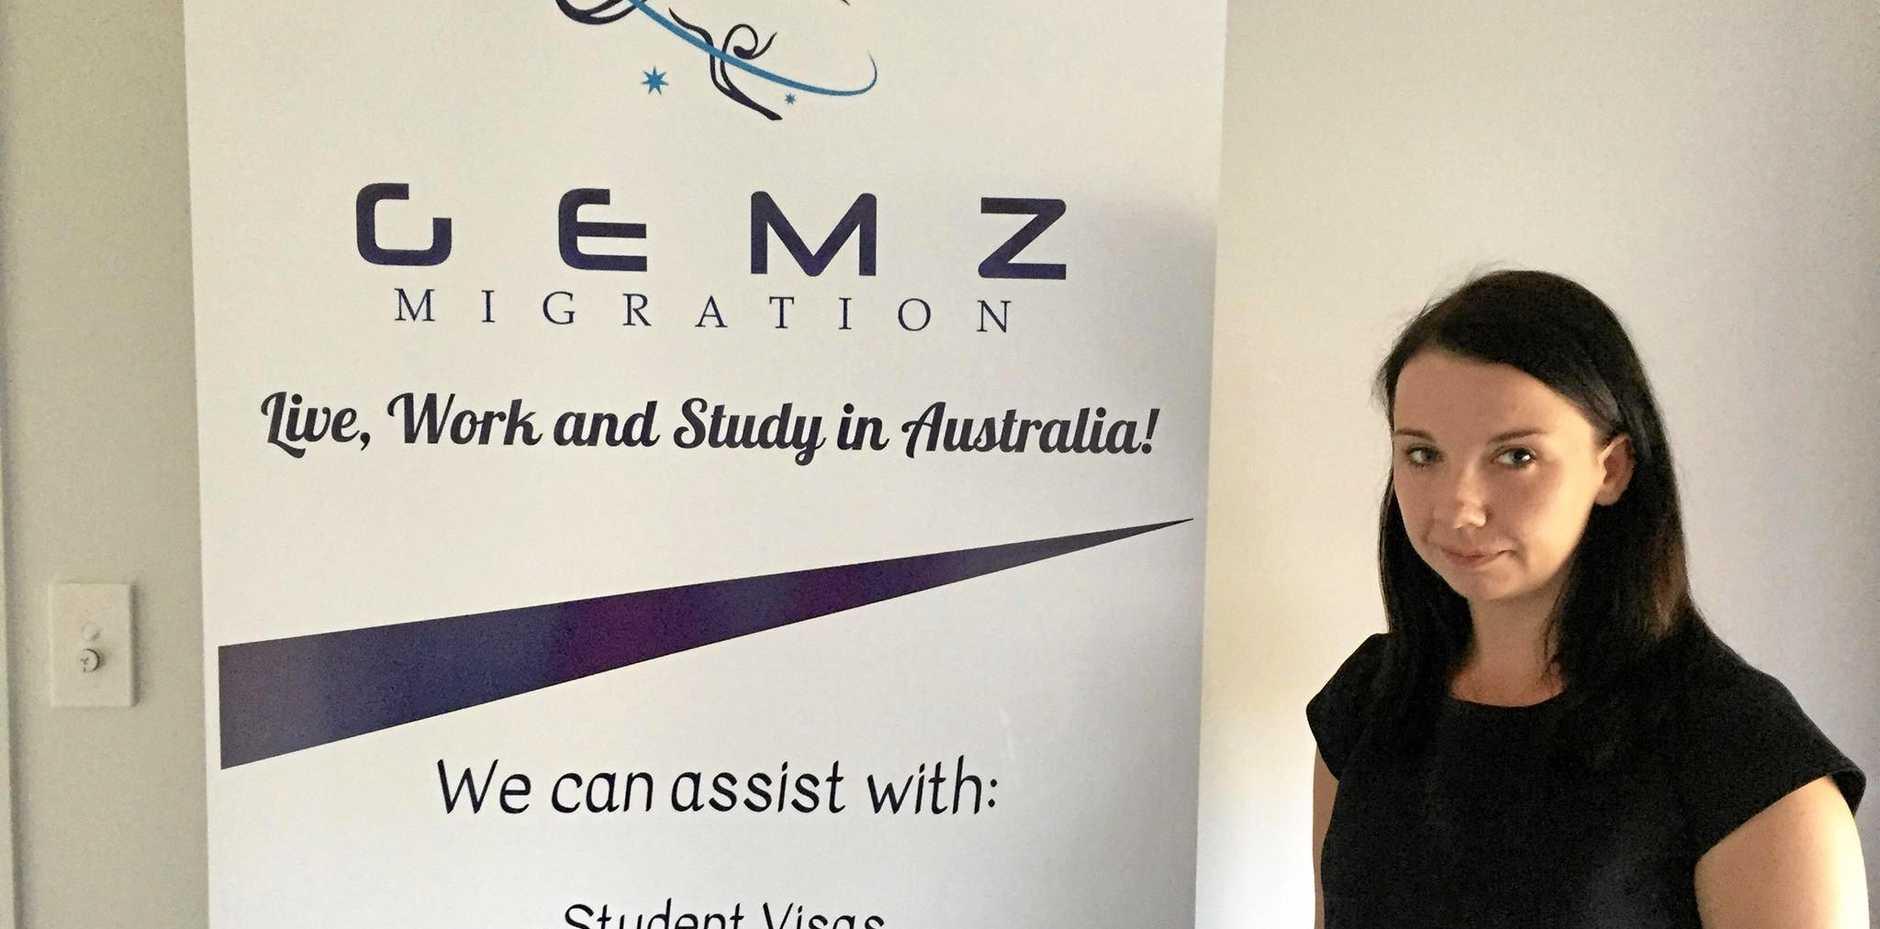 TOUGH TEST: Bundaberg migration agent Edyta Gradowska, who was born in Poland, got one question wrong on the citizenship